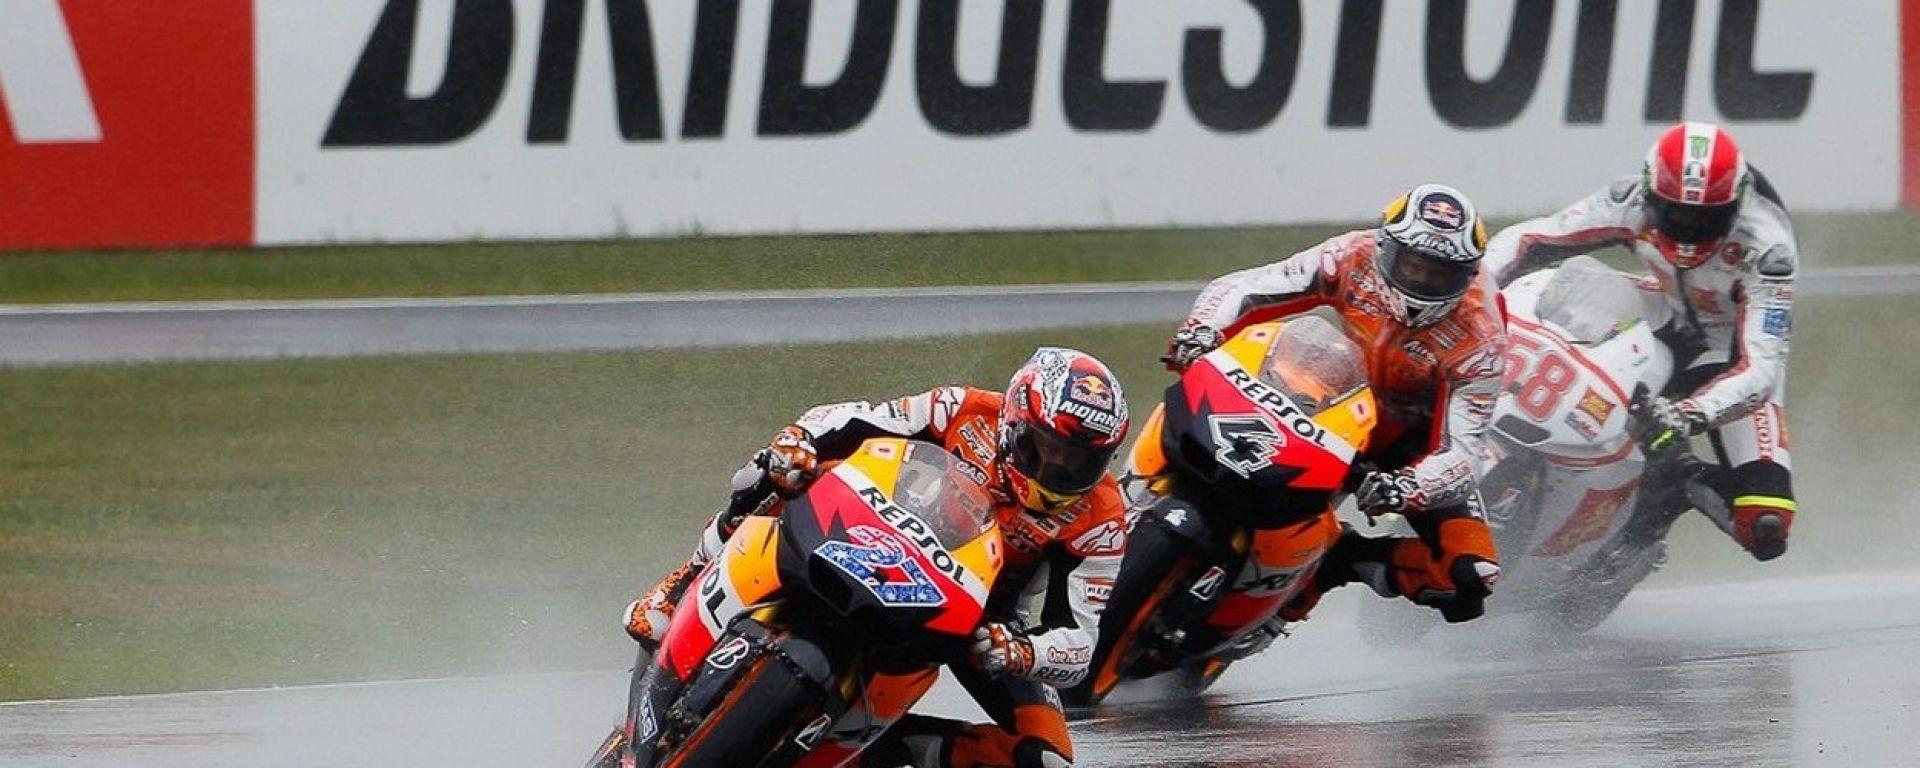 Gran Premio di Inghilterra